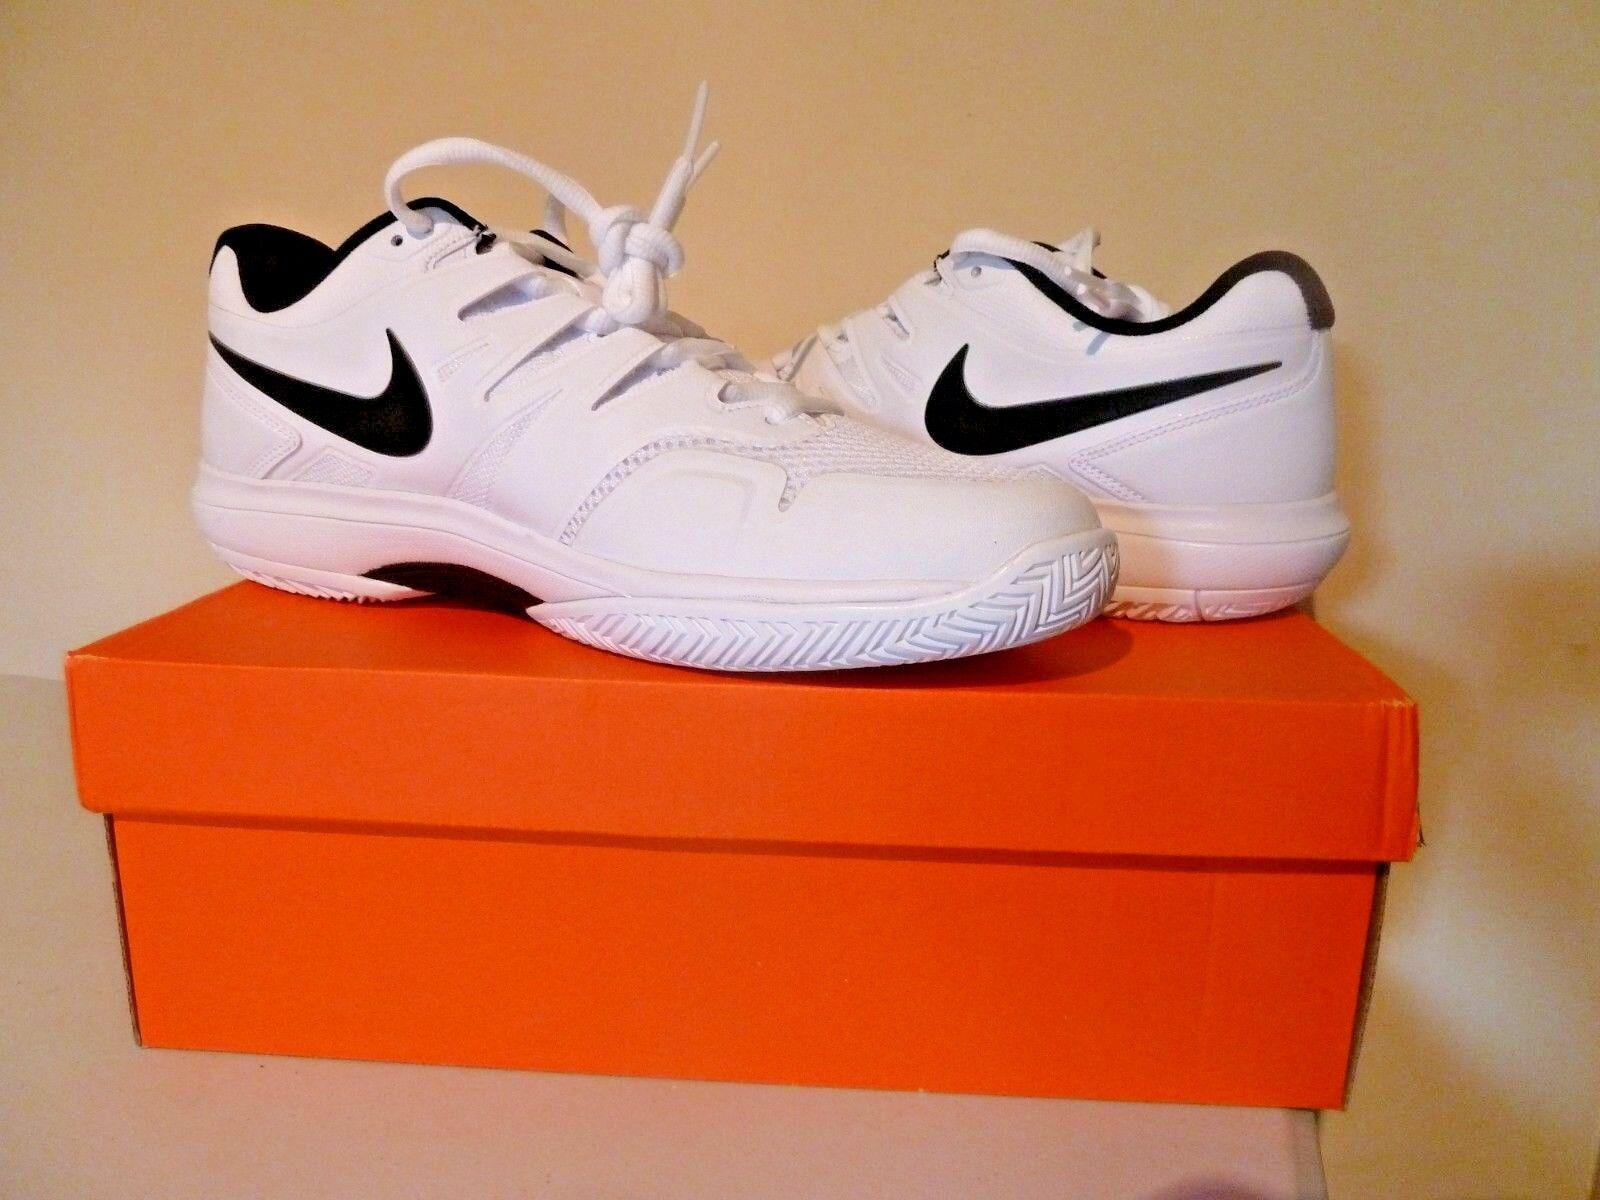 Nike Air Zoom Prestige scarpa da tennis/Scarpe Da Ginnastica BIANCO NUOVO IN SCATOLA RRP